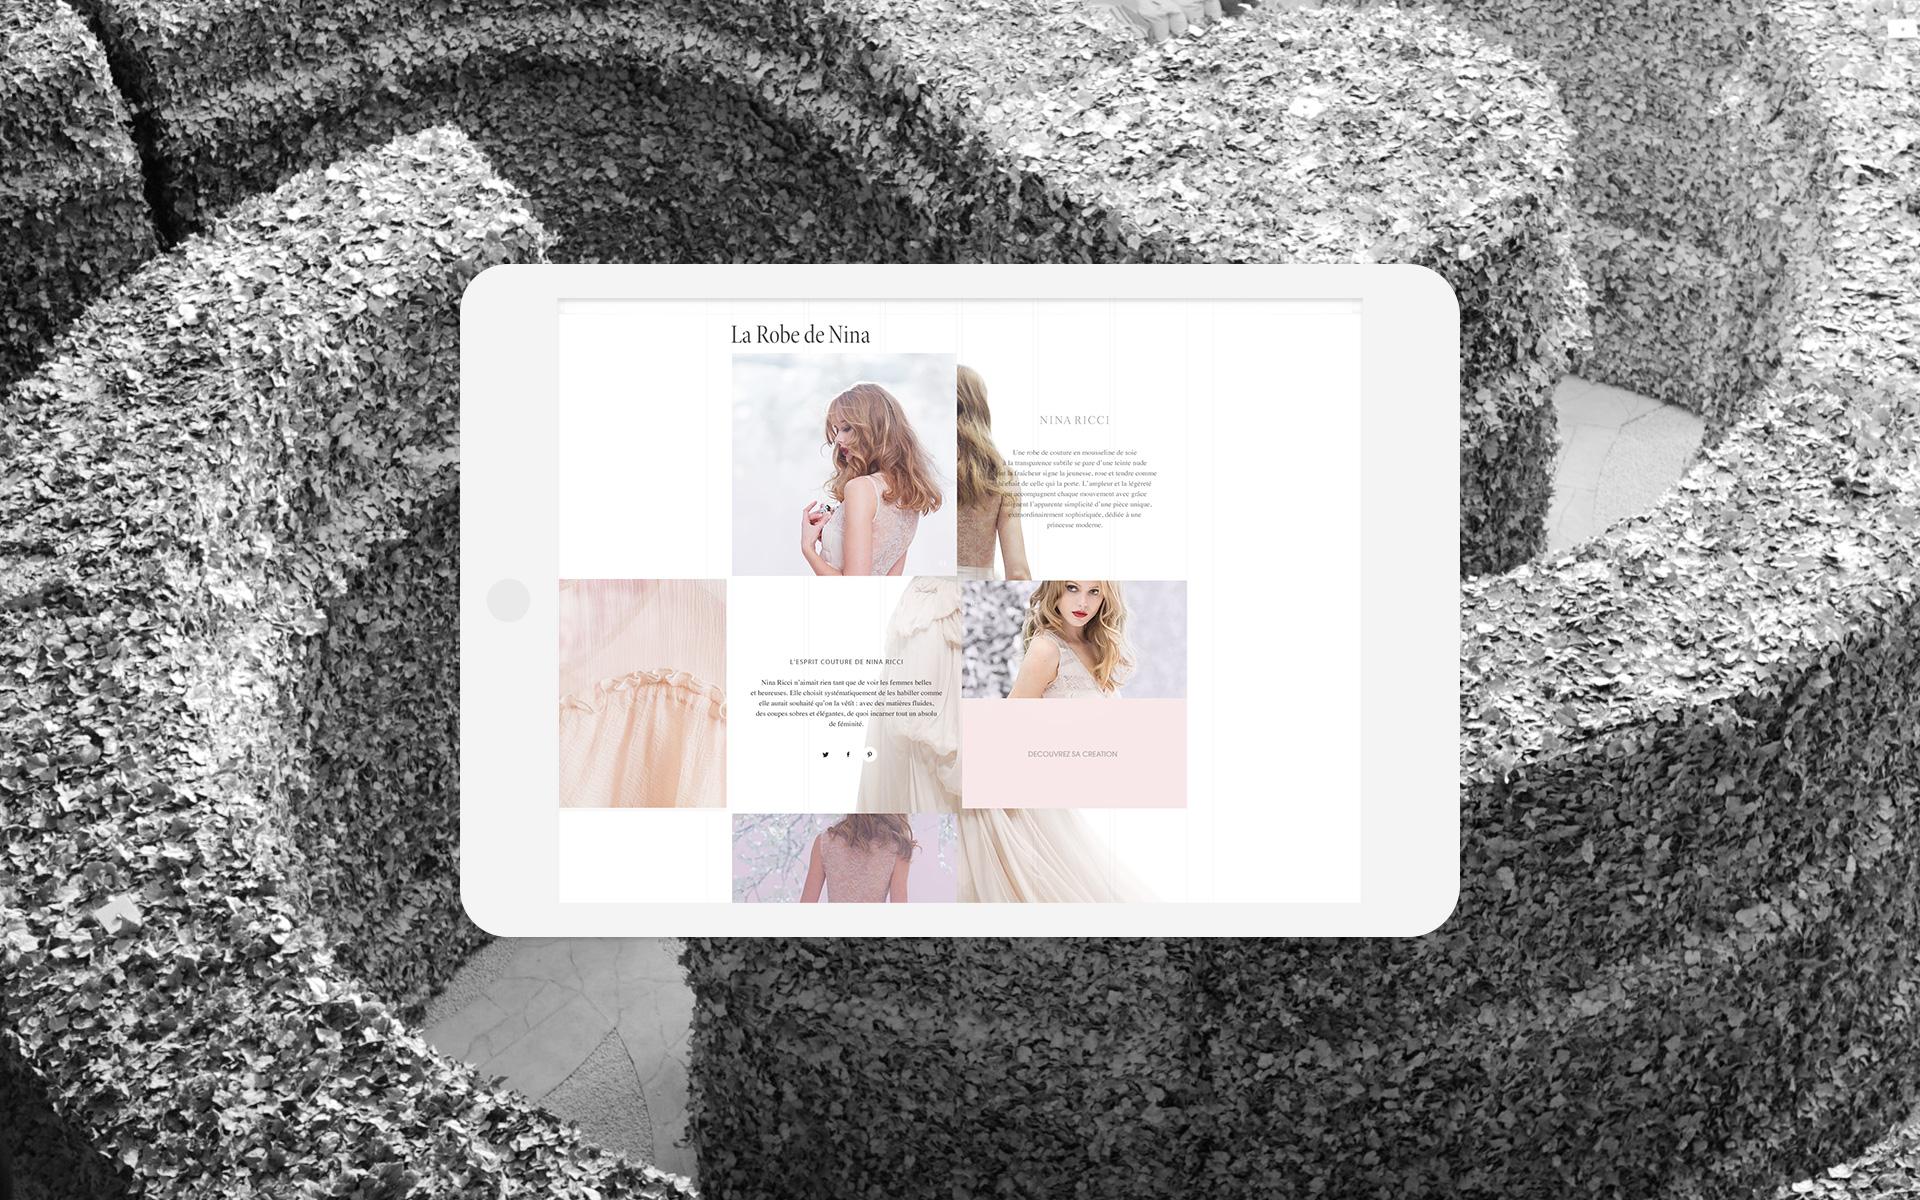 helene-chataigner-nina-web-design-screen-04-big